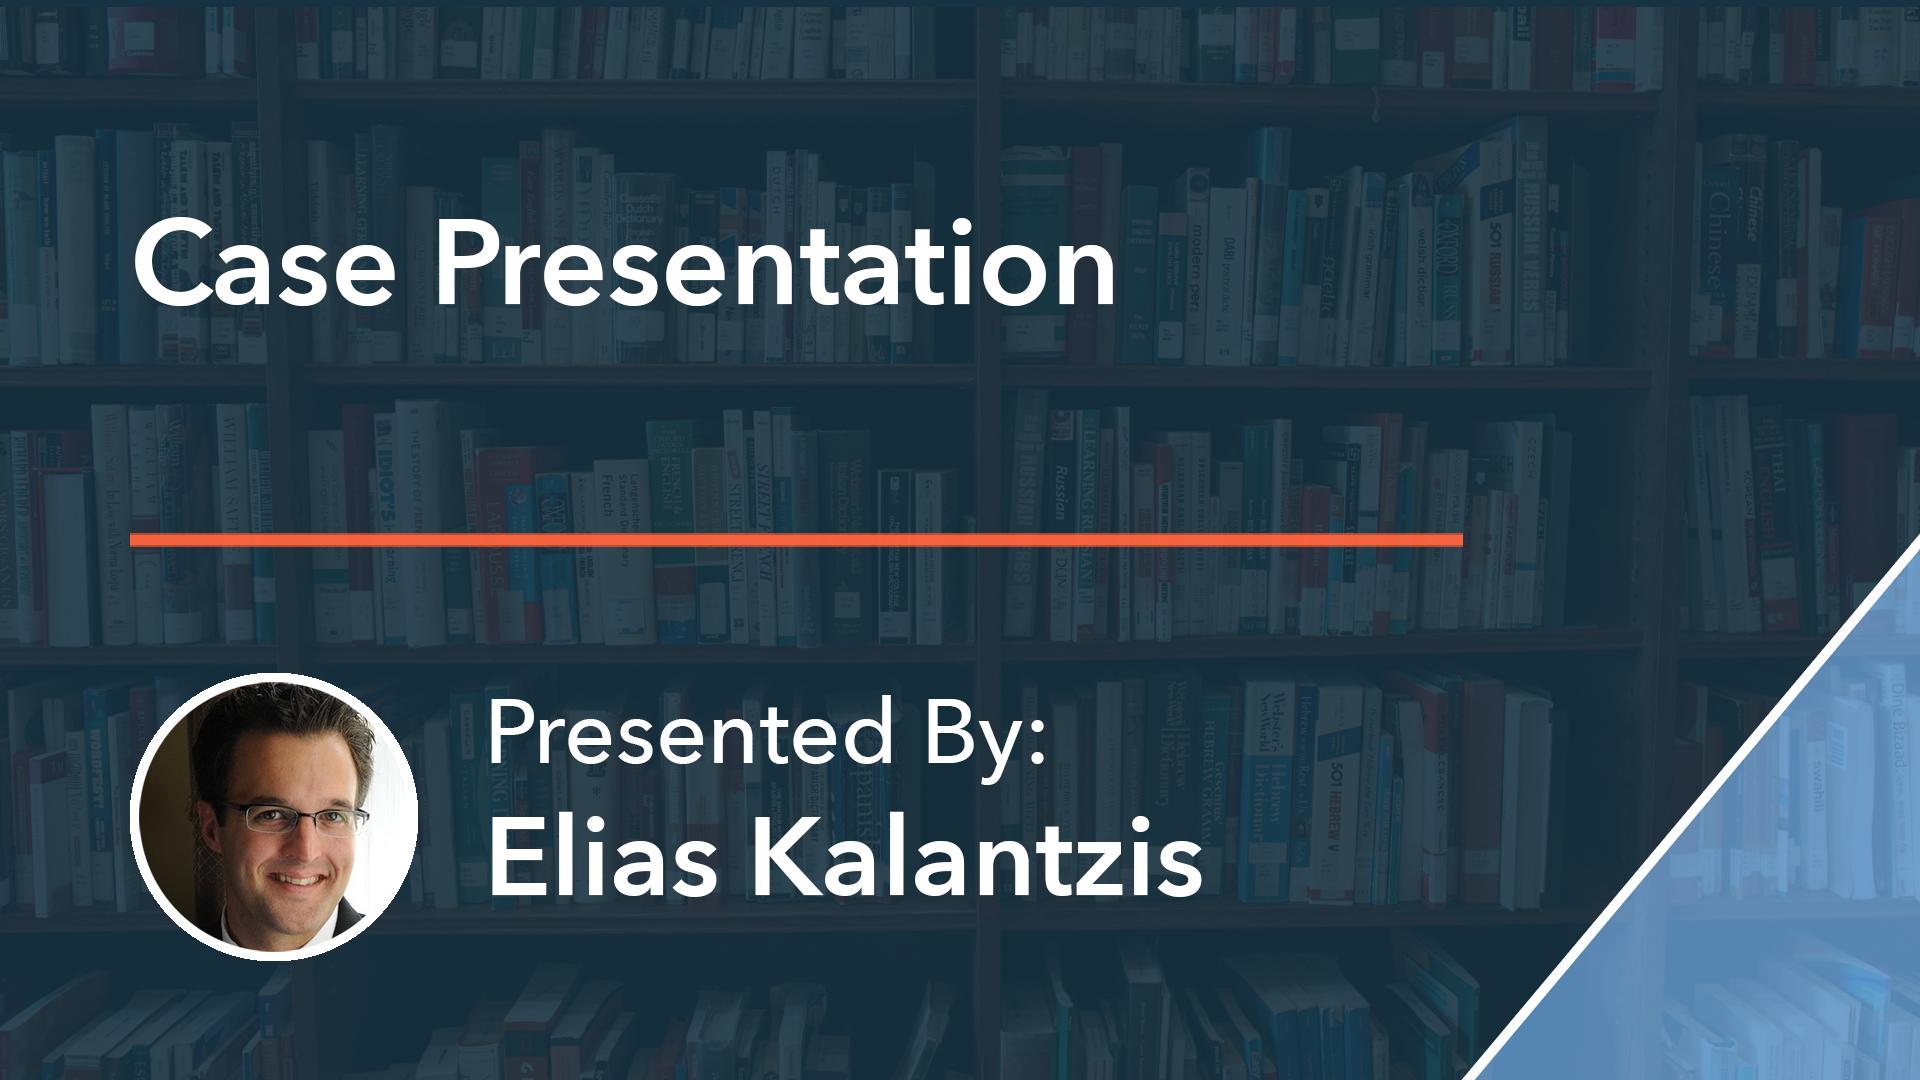 https://osauniversity.org/wp-content/uploads/2019/07/Case-Presentation.png